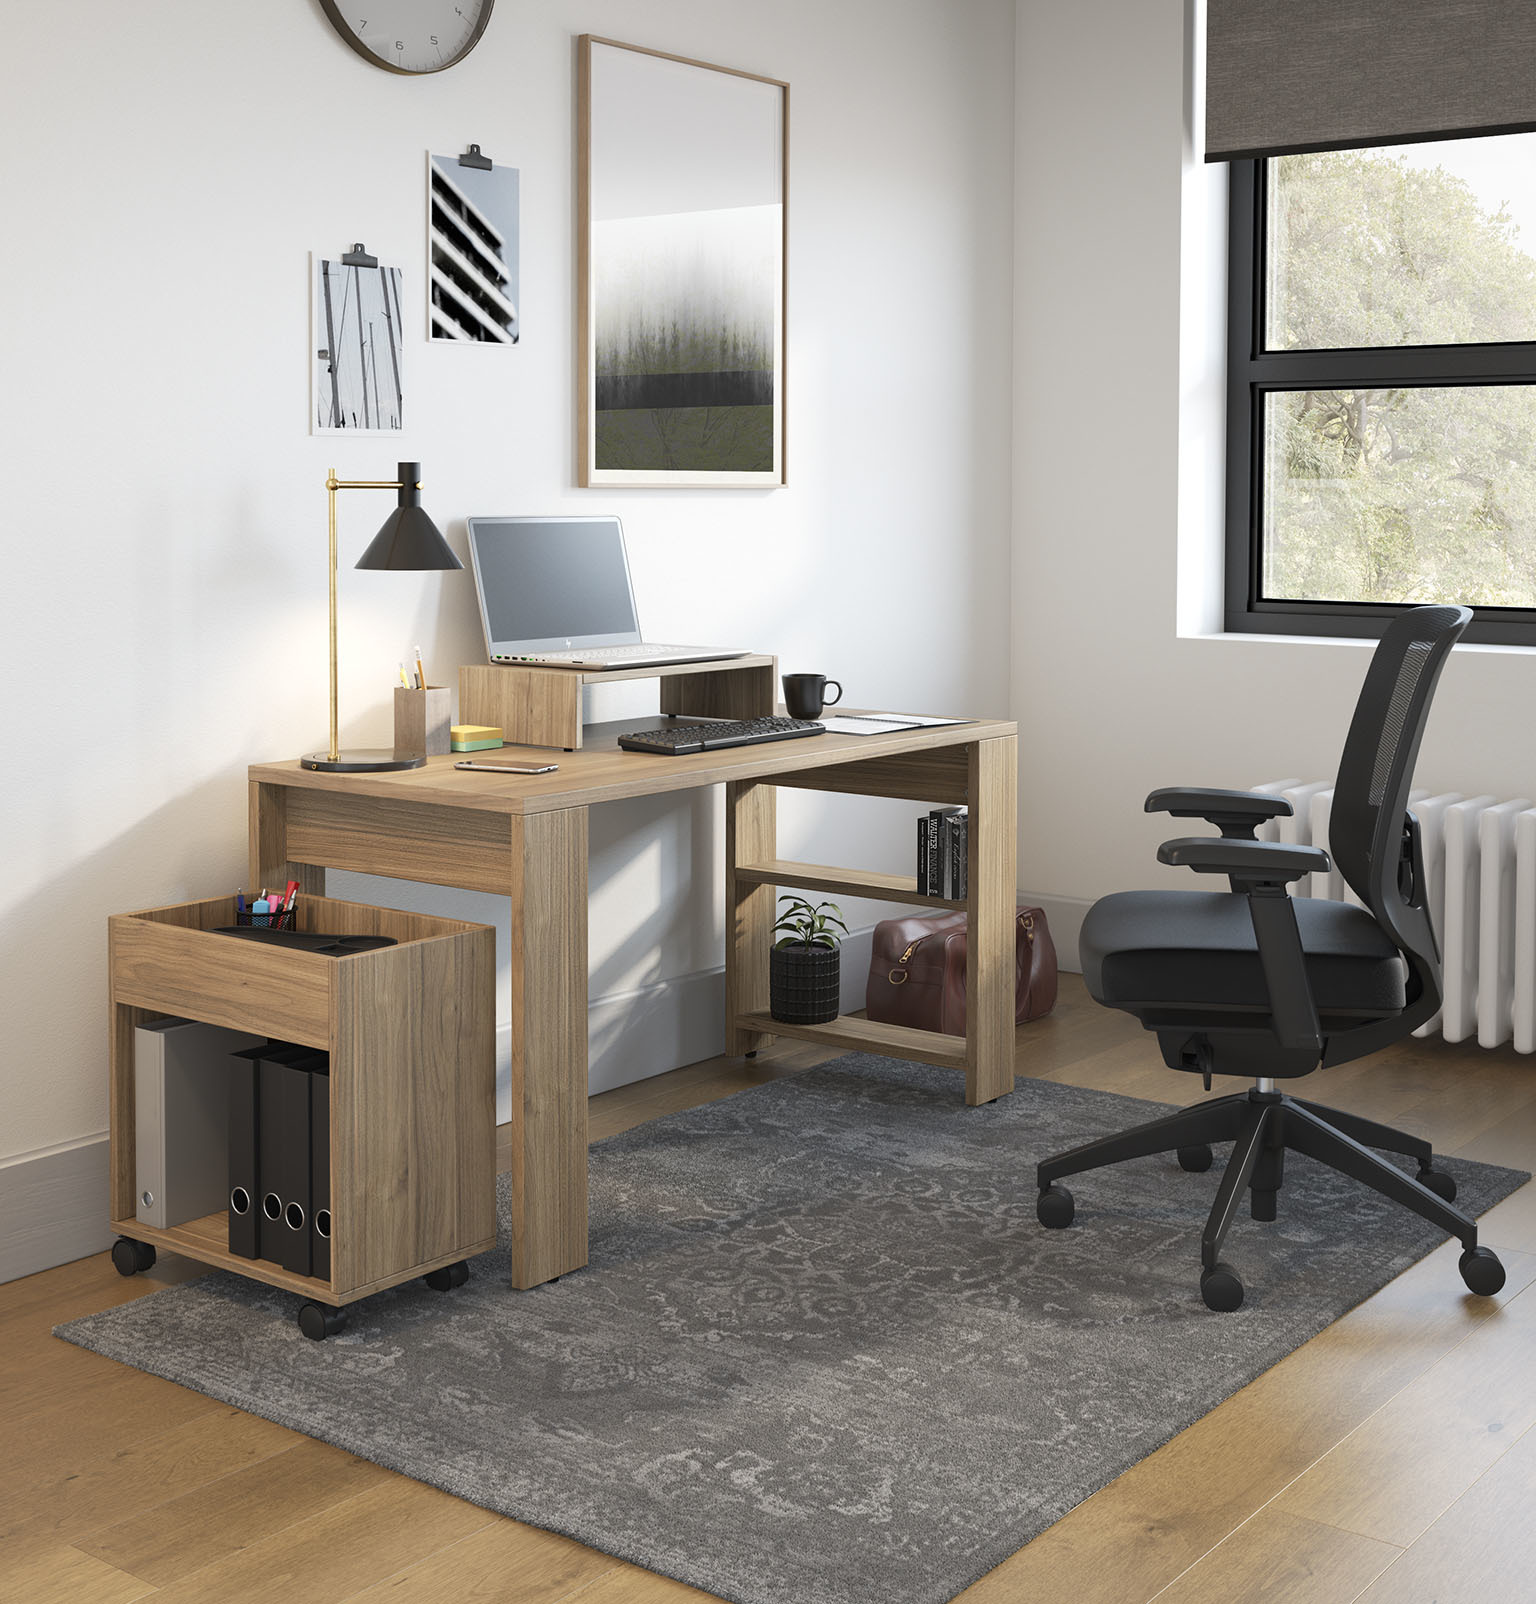 Office Furniture Worke